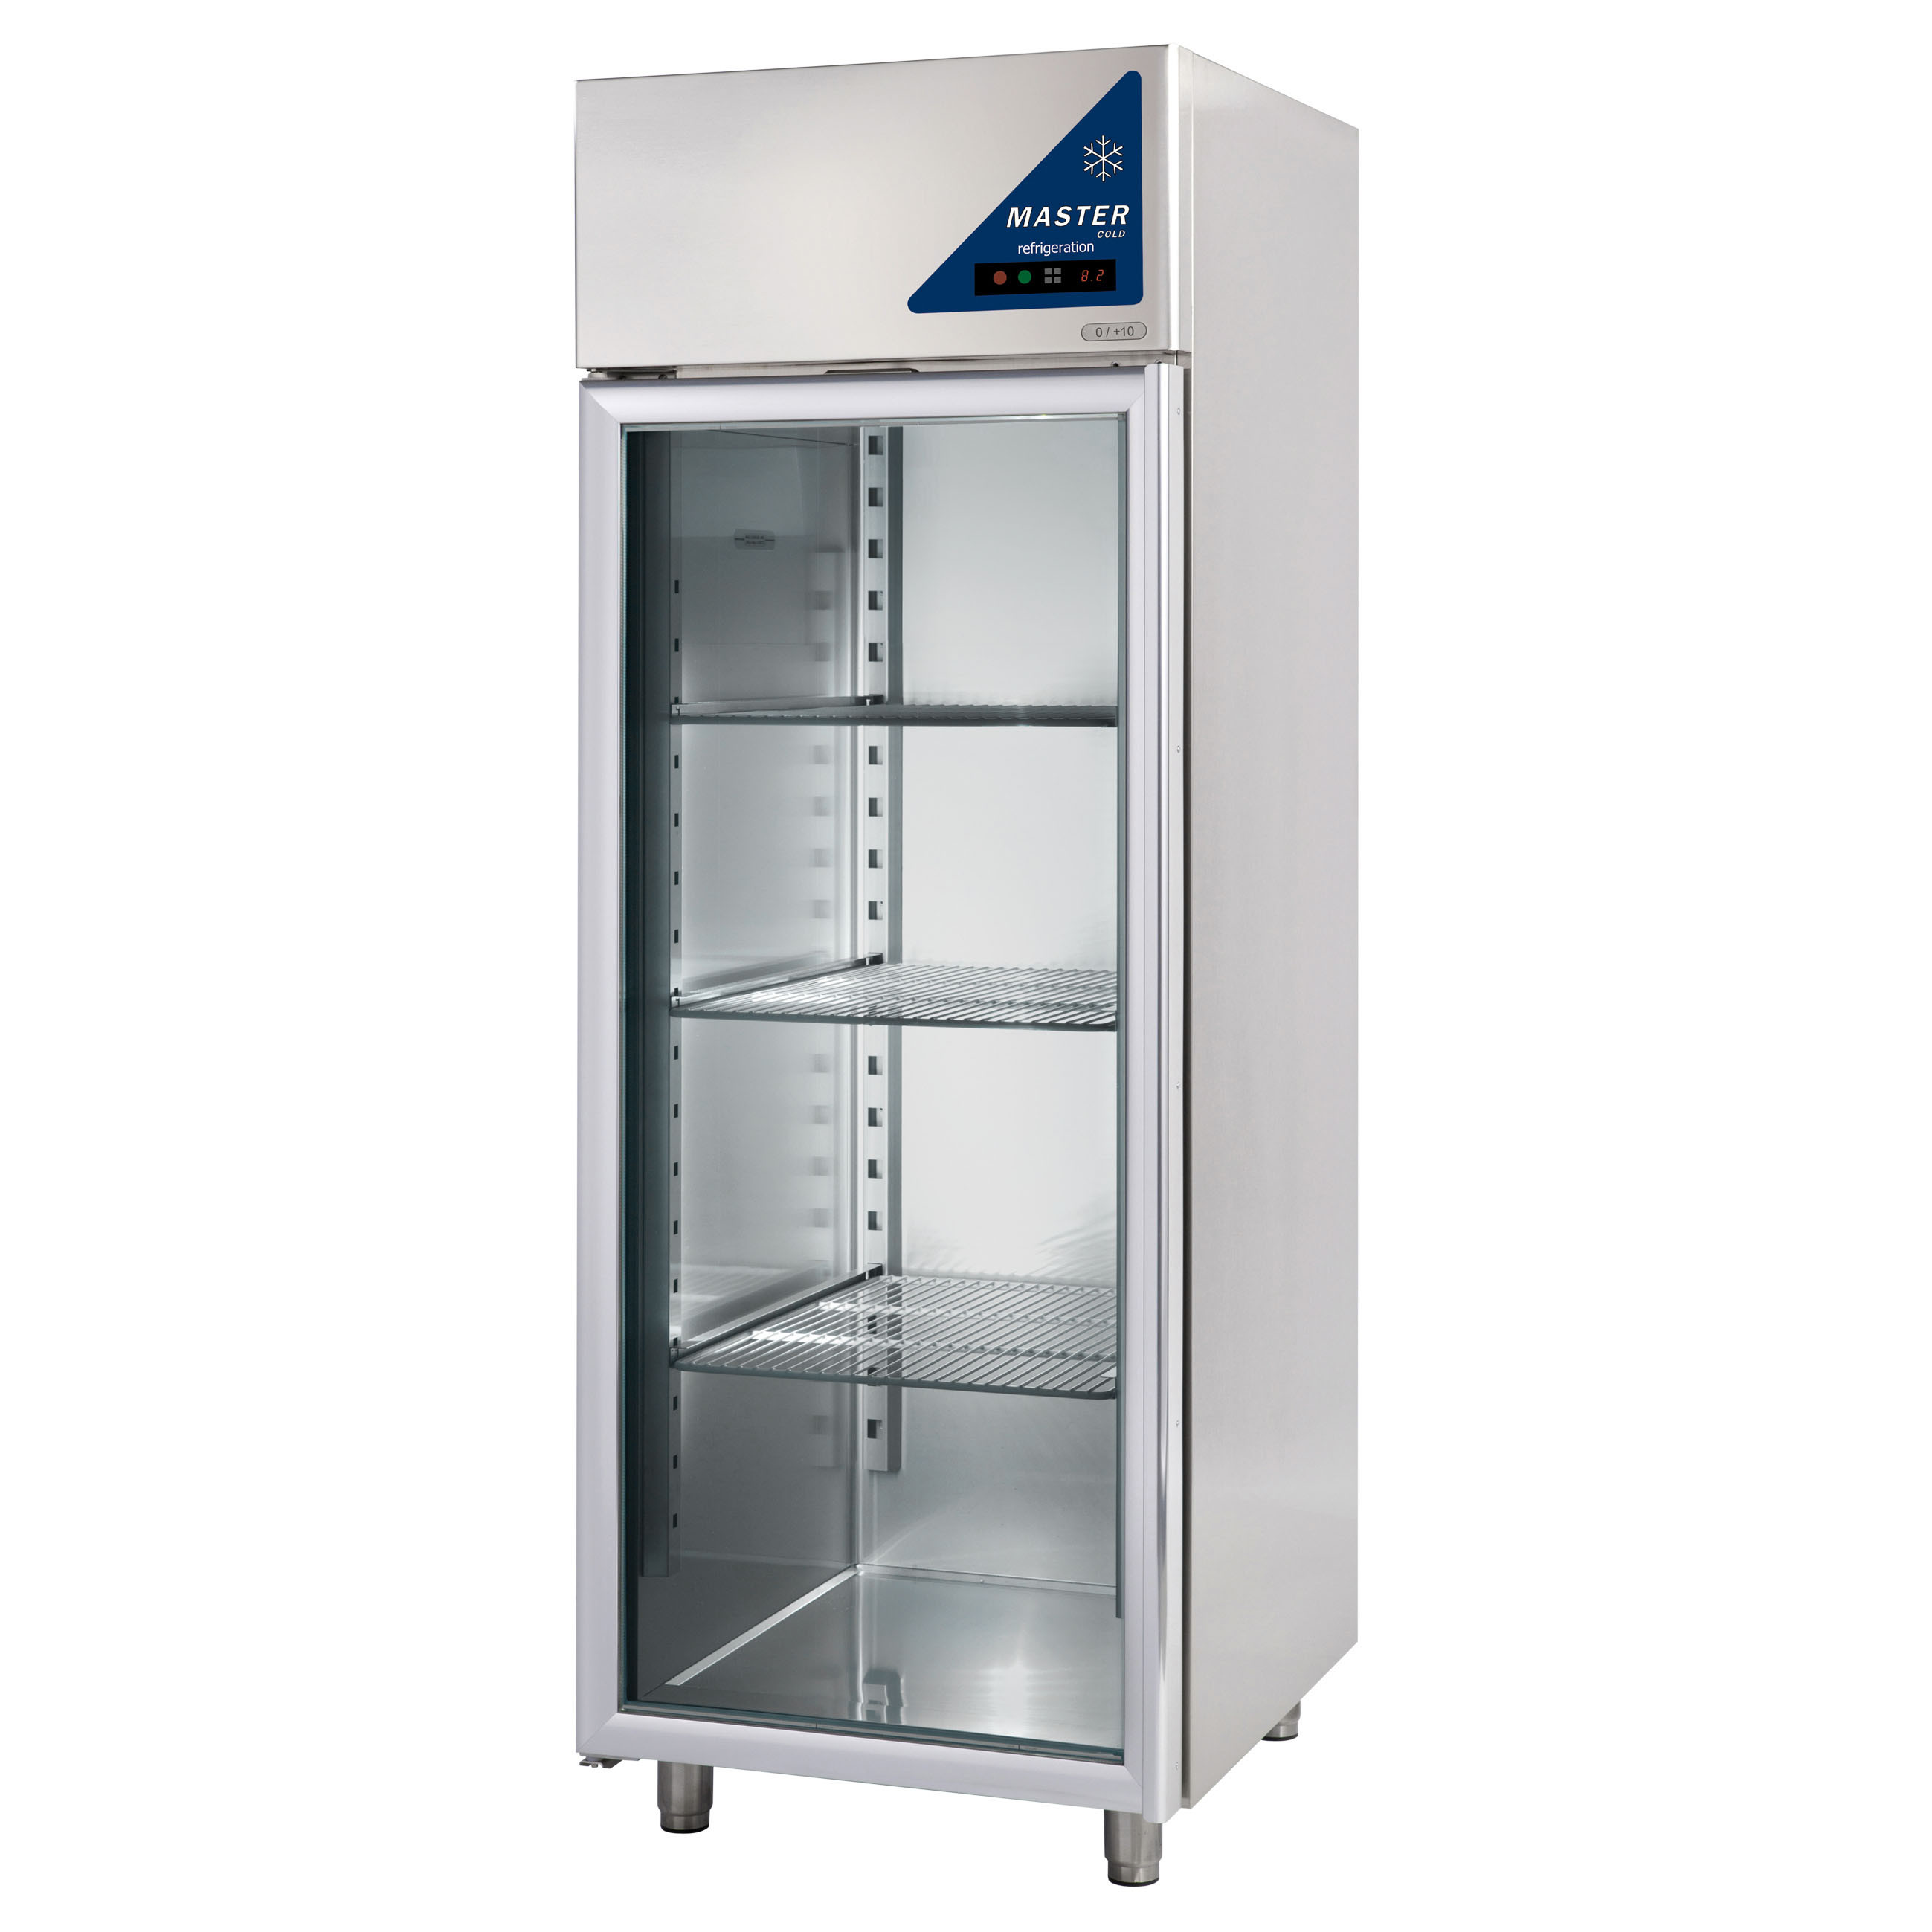 Kühlschrank Master 600 Plus Glas - Gastro Kühl- & Tiefkühlschränke ...